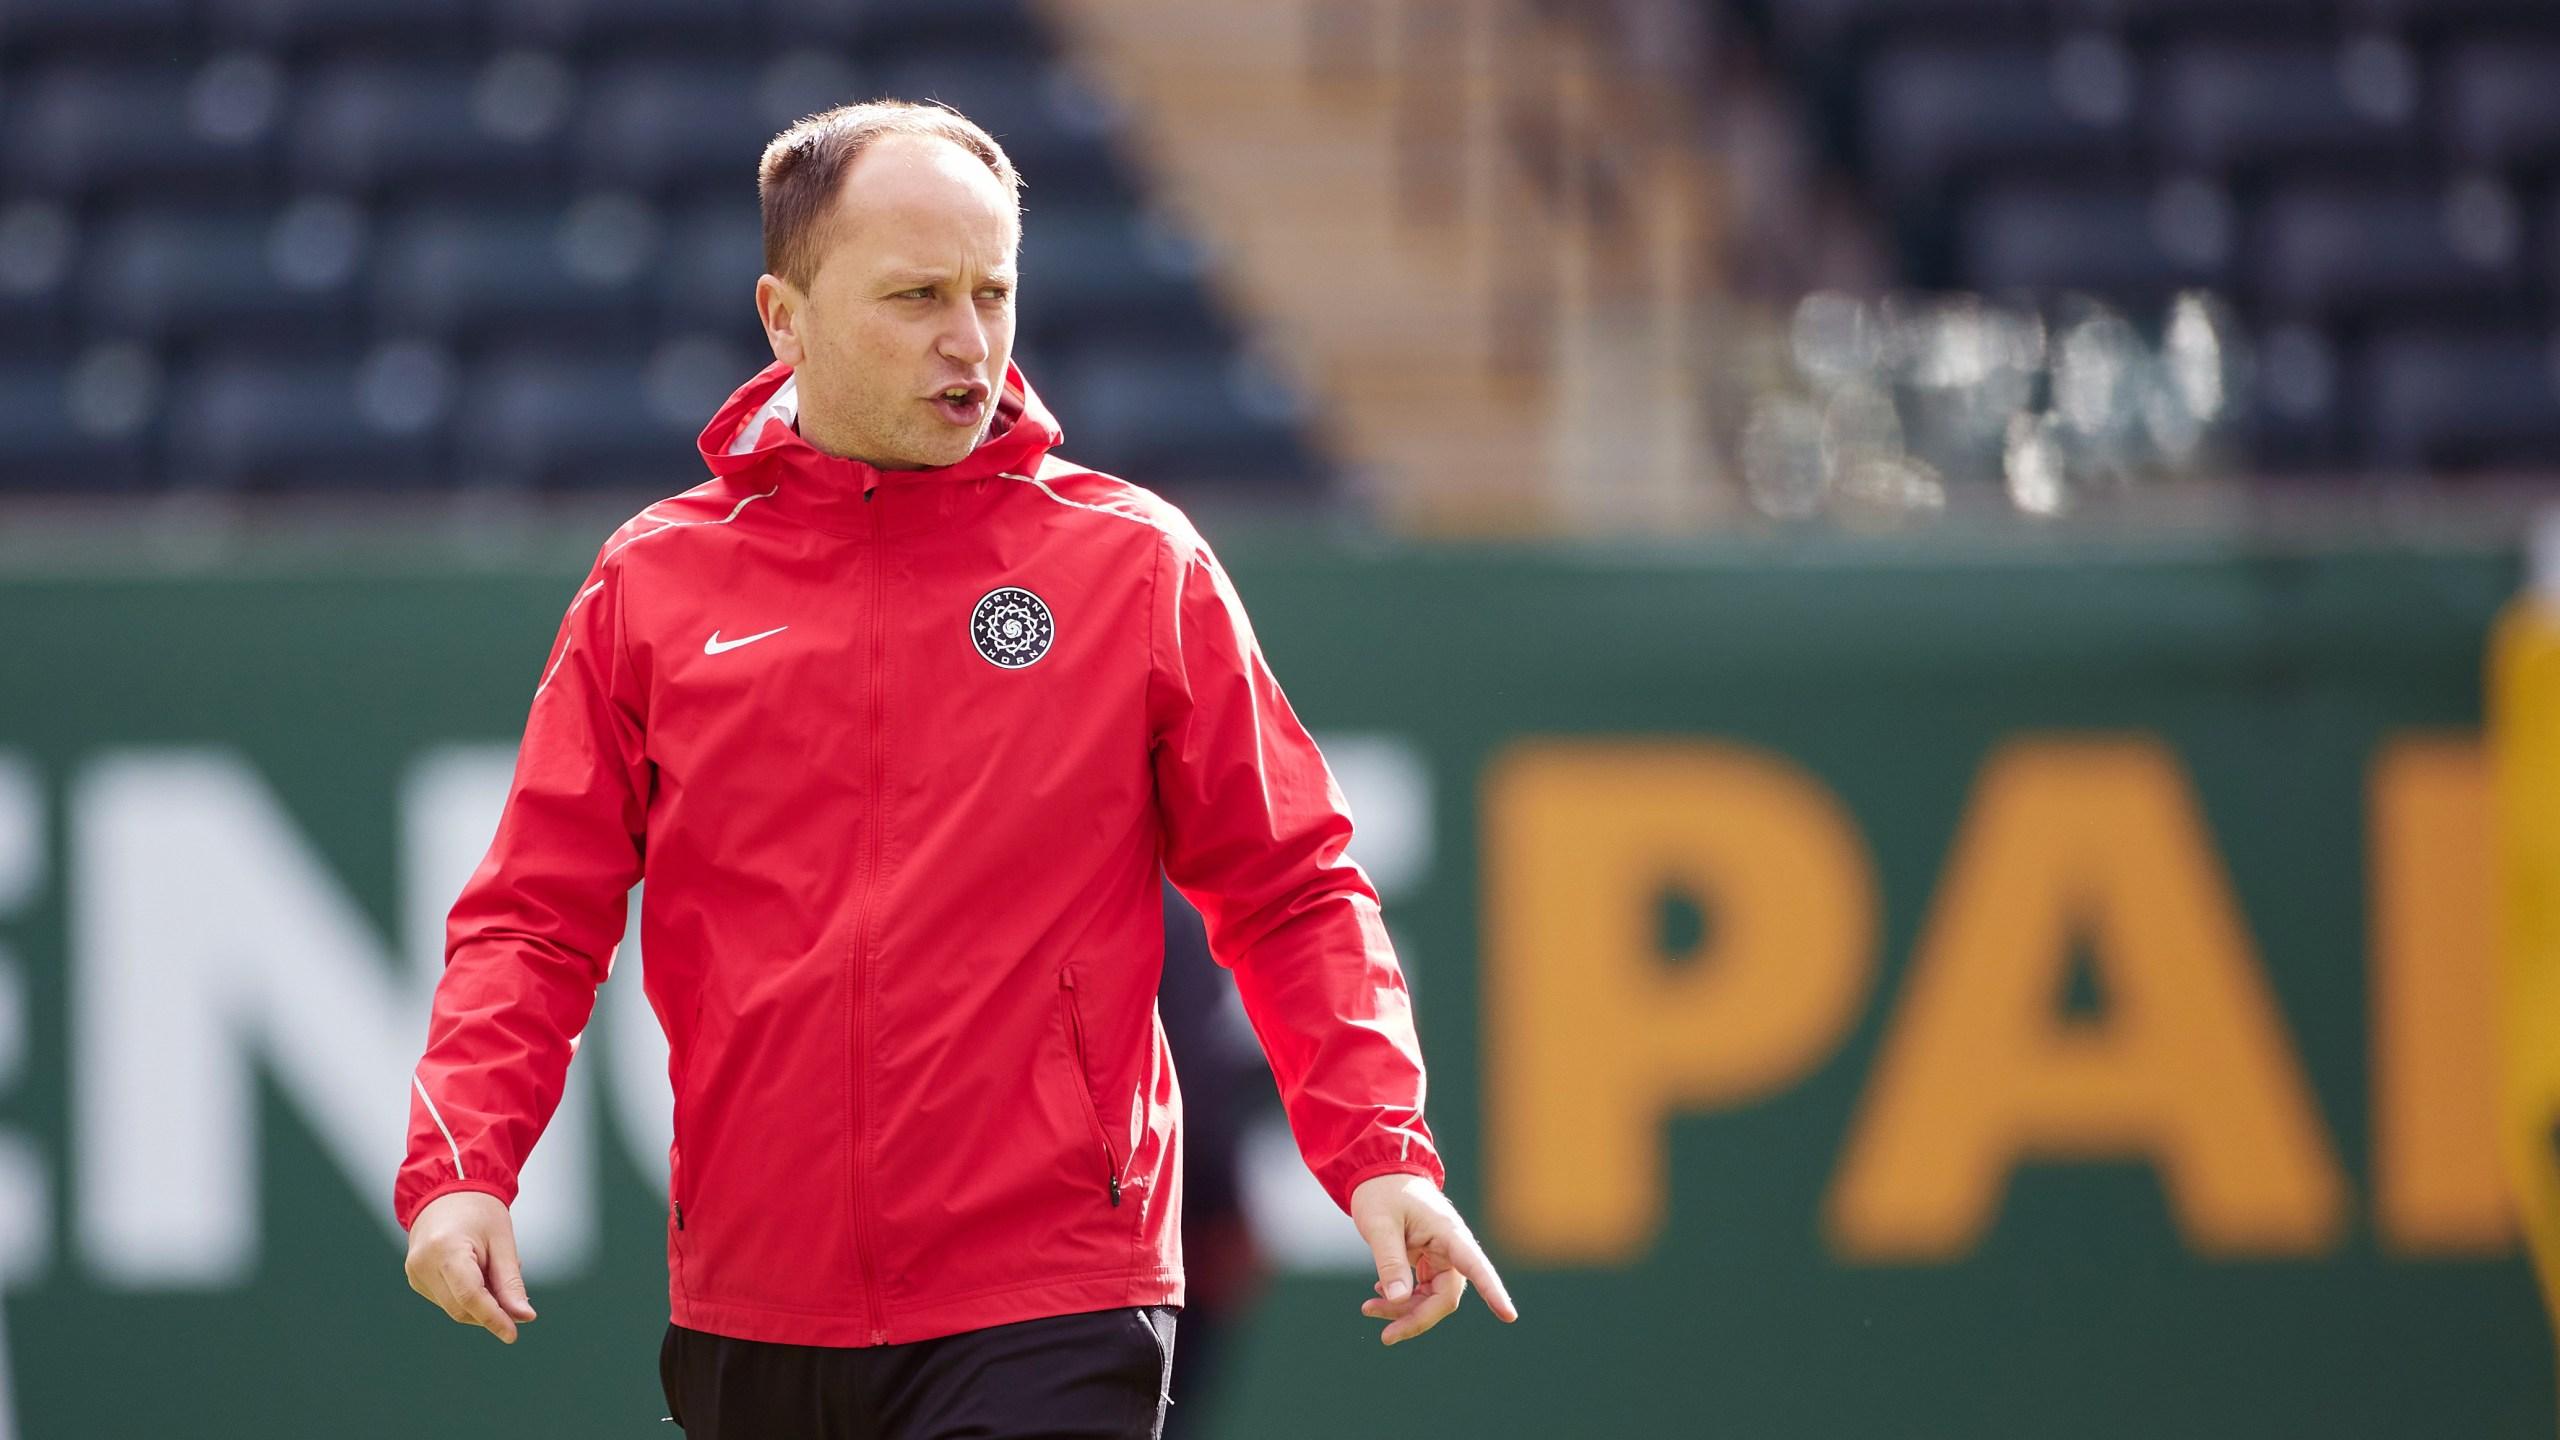 Portland Thorns Head Coach Mark Parsons